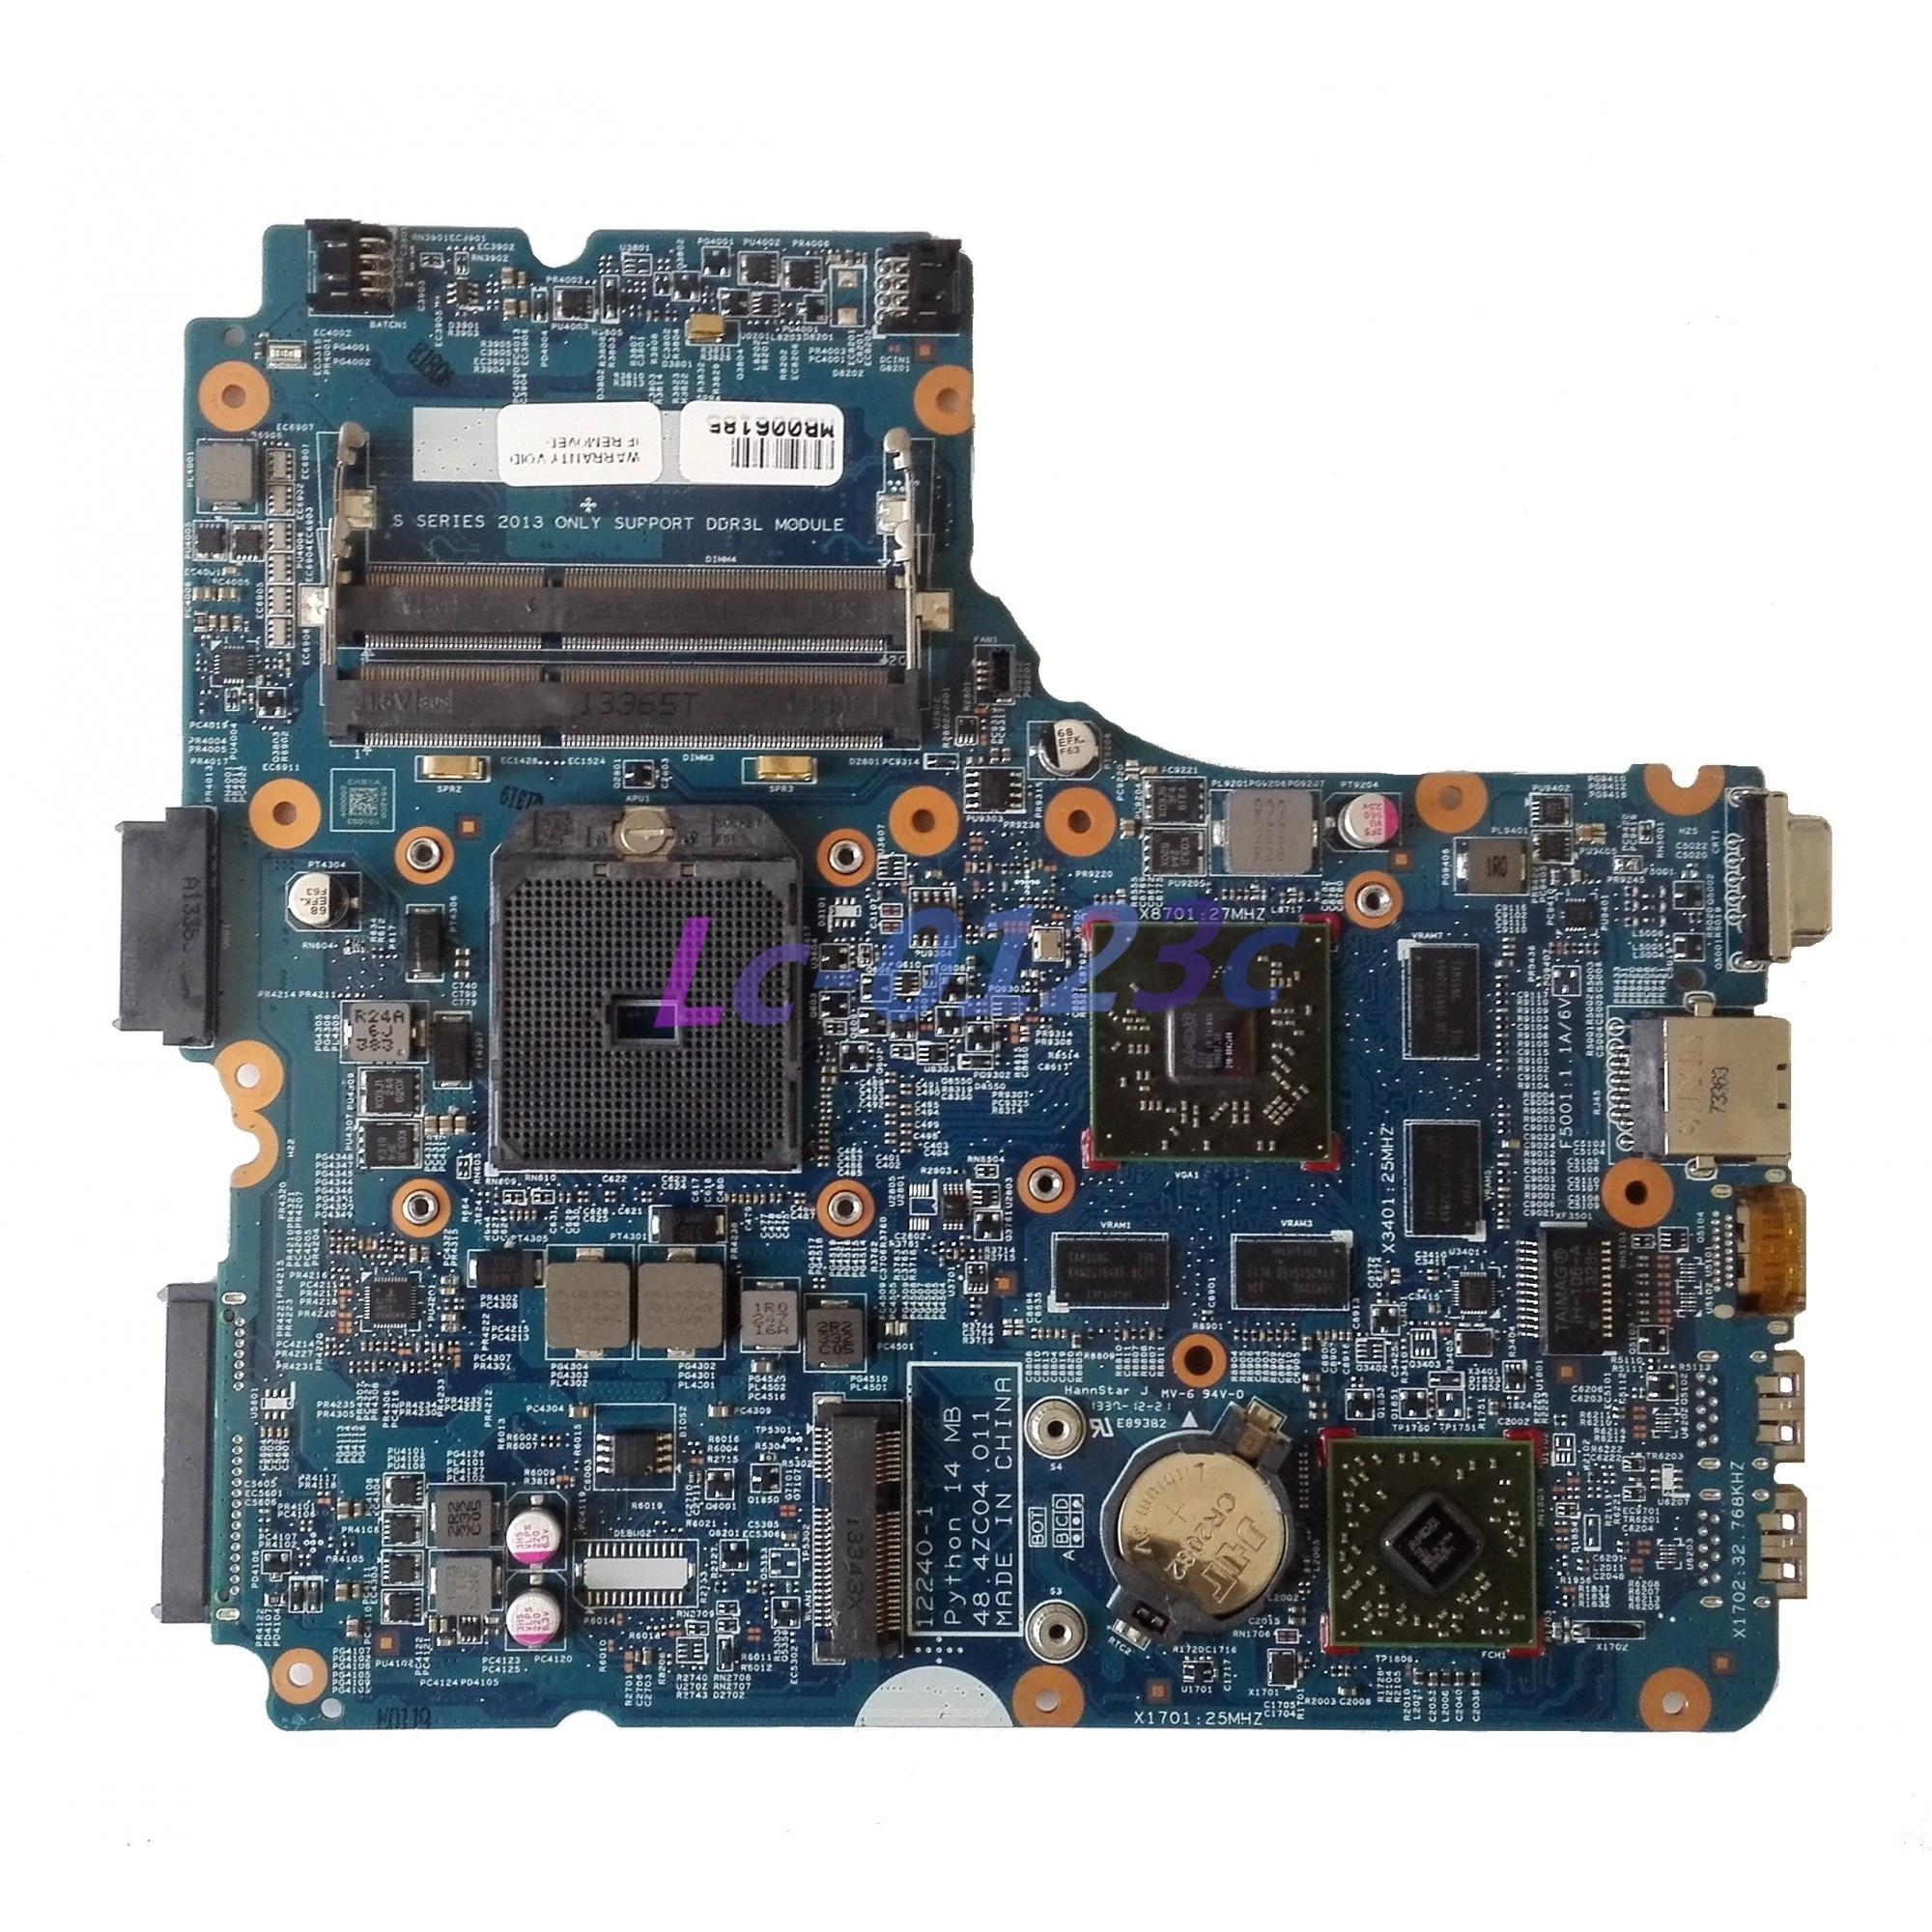 Fulcol для hp PROBOOK 455 G1 Материнская плата ноутбука w/8750 м 2 Гб 48.4ZC04.011 722821-001 722821-501 722821-601 DDR3